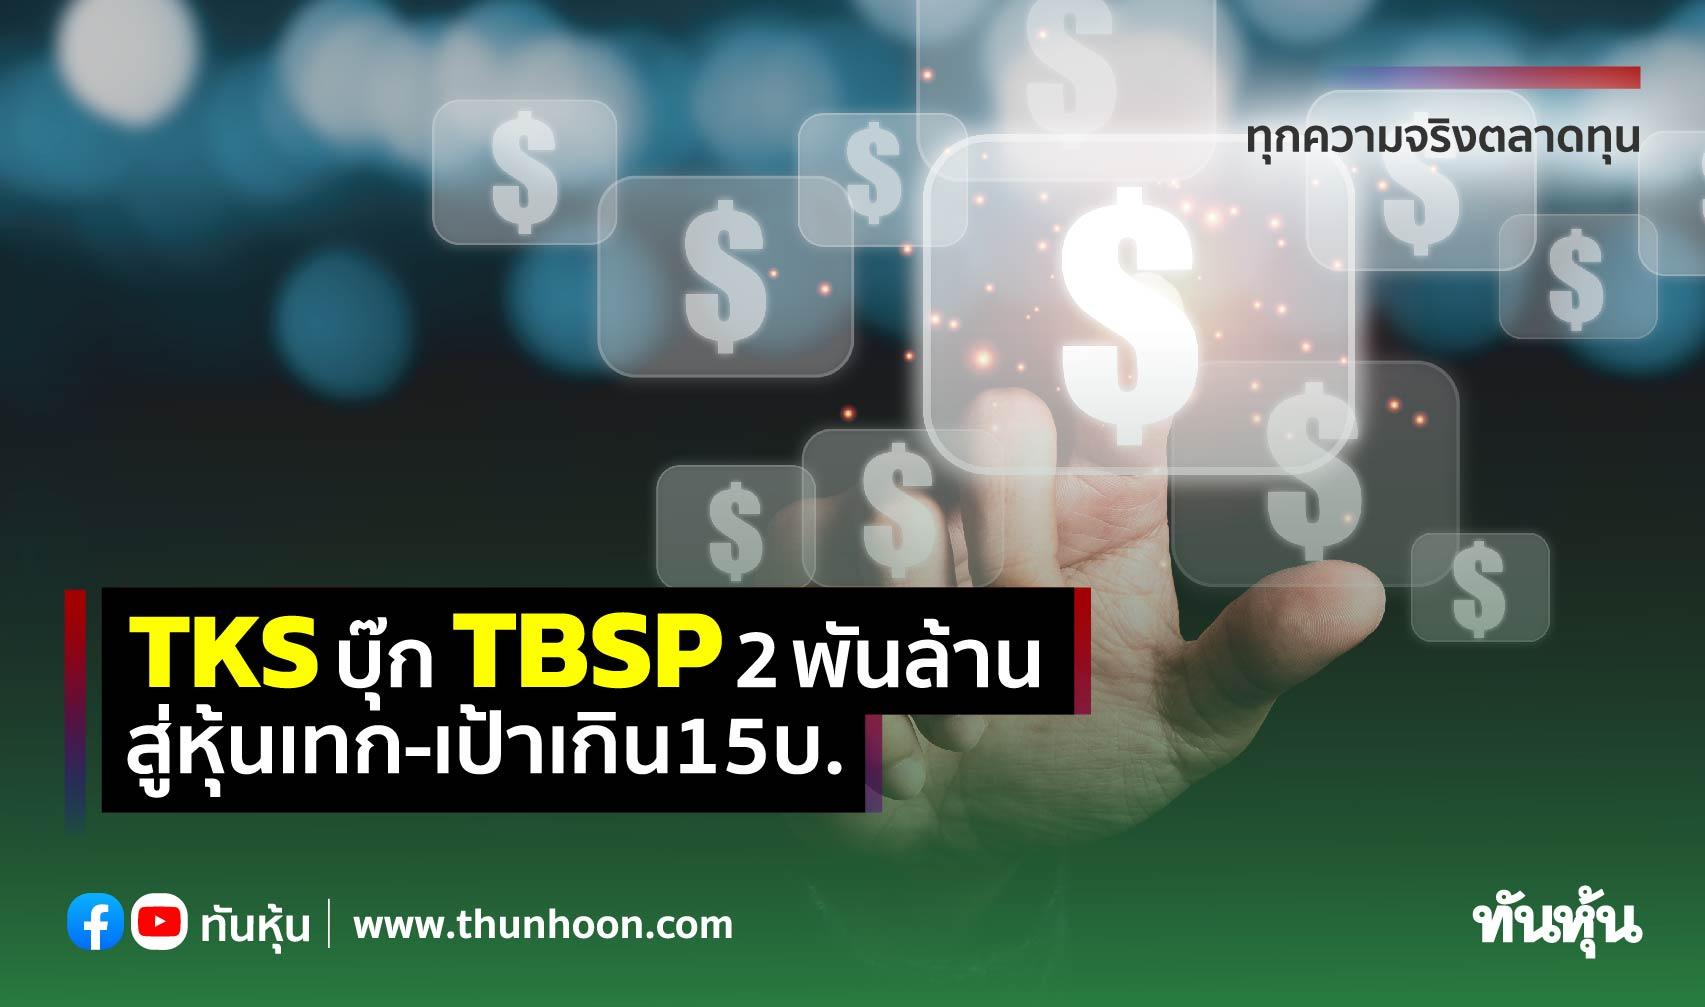 TKSบุ๊กTBSP2พันล้าน สู่หุ้นเทค-เป้าเกิน15บ.